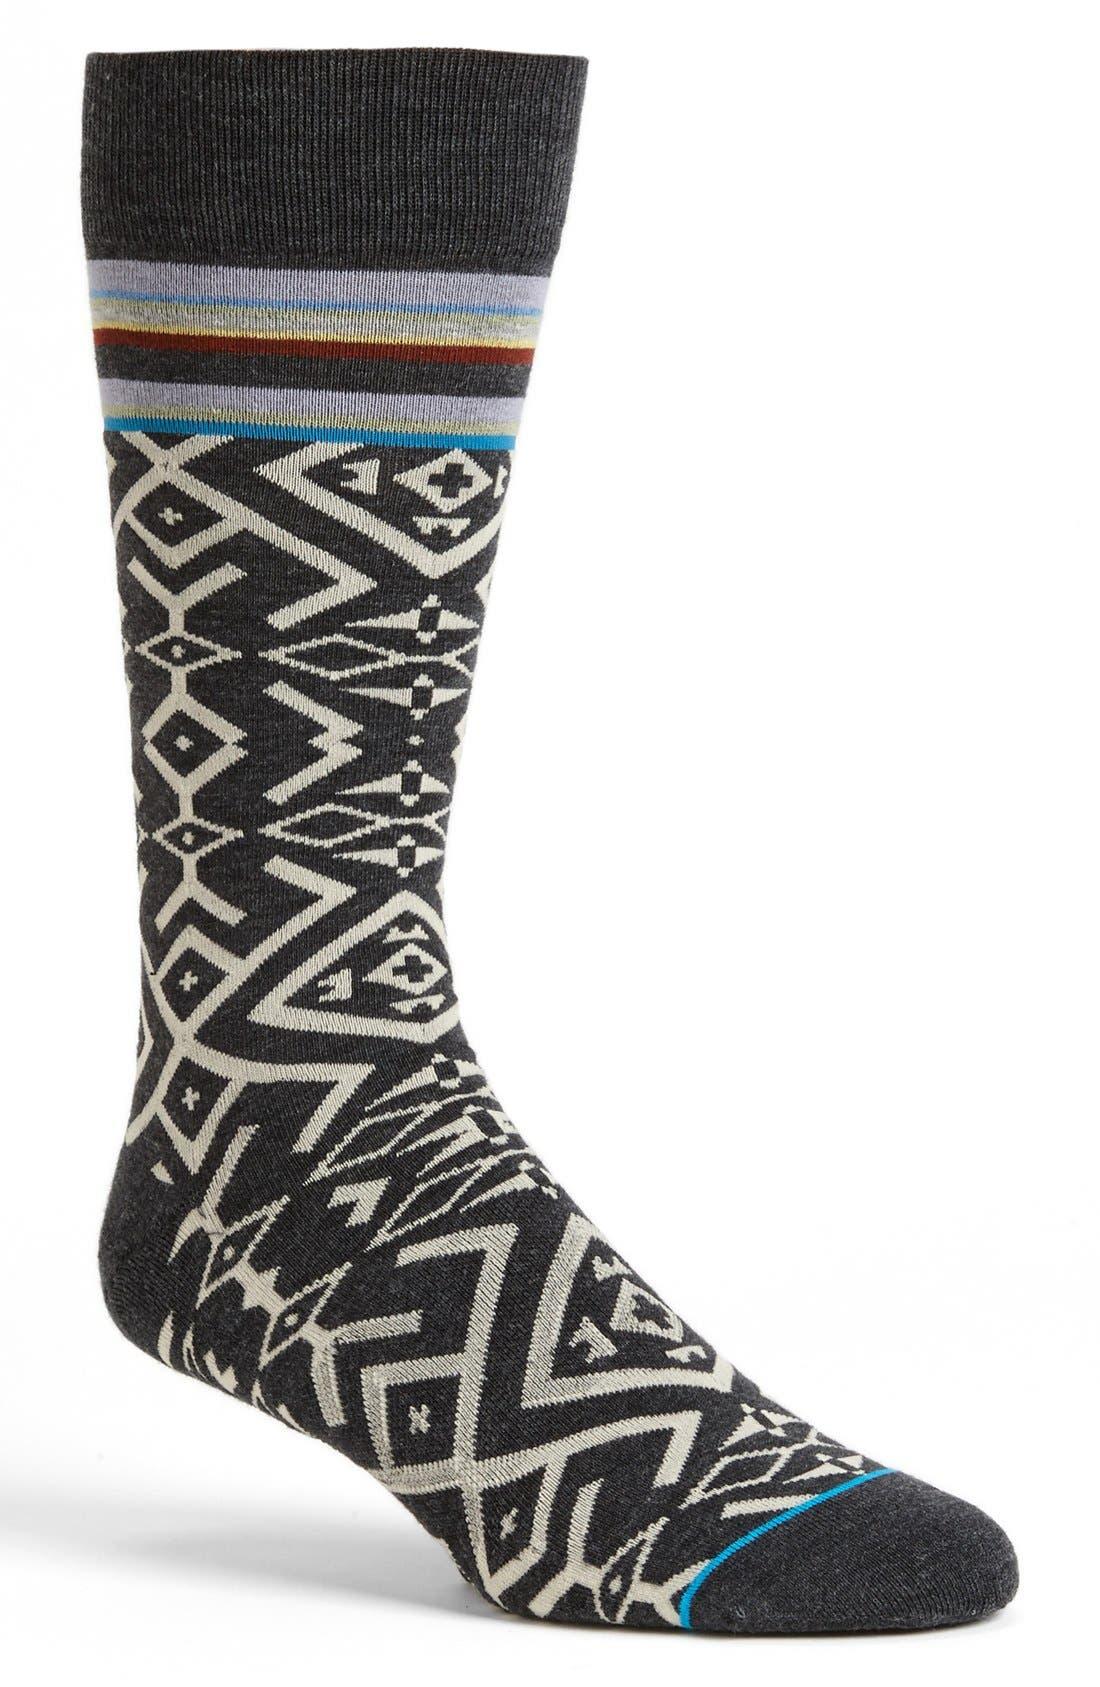 Alternate Image 1 Selected - Stance 'Casablanca' Socks